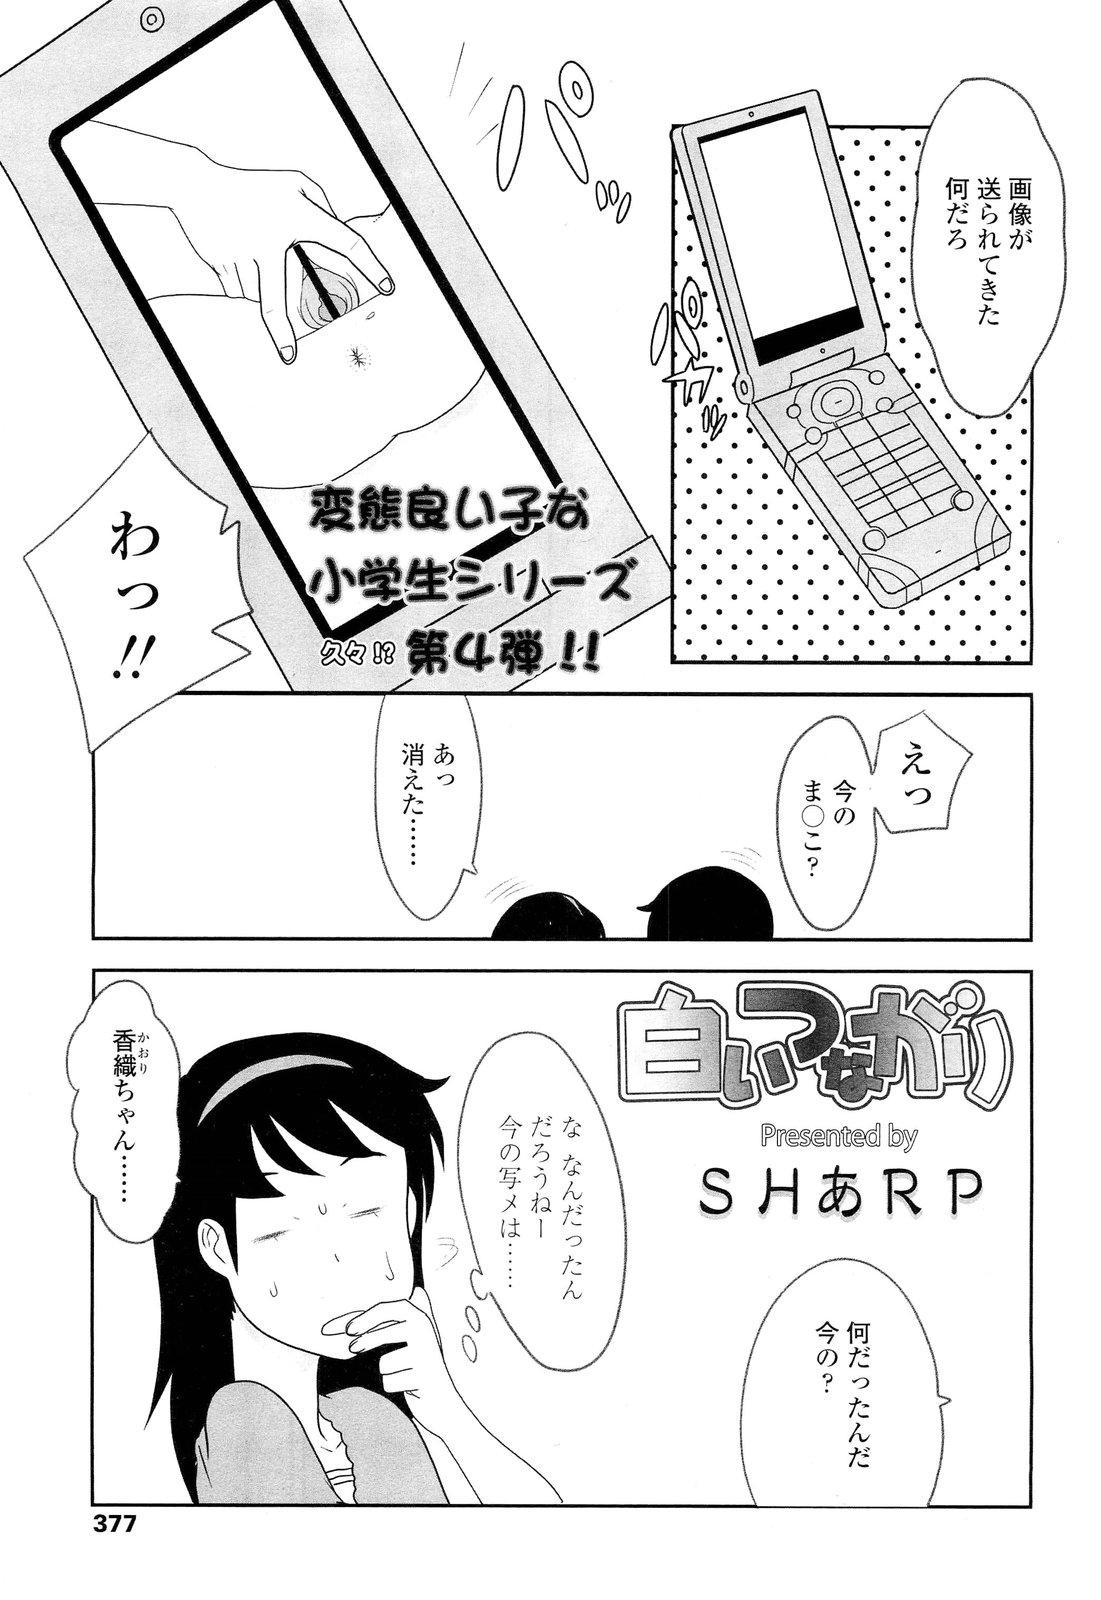 COMIC LO 2012-05 Vol. 98 376